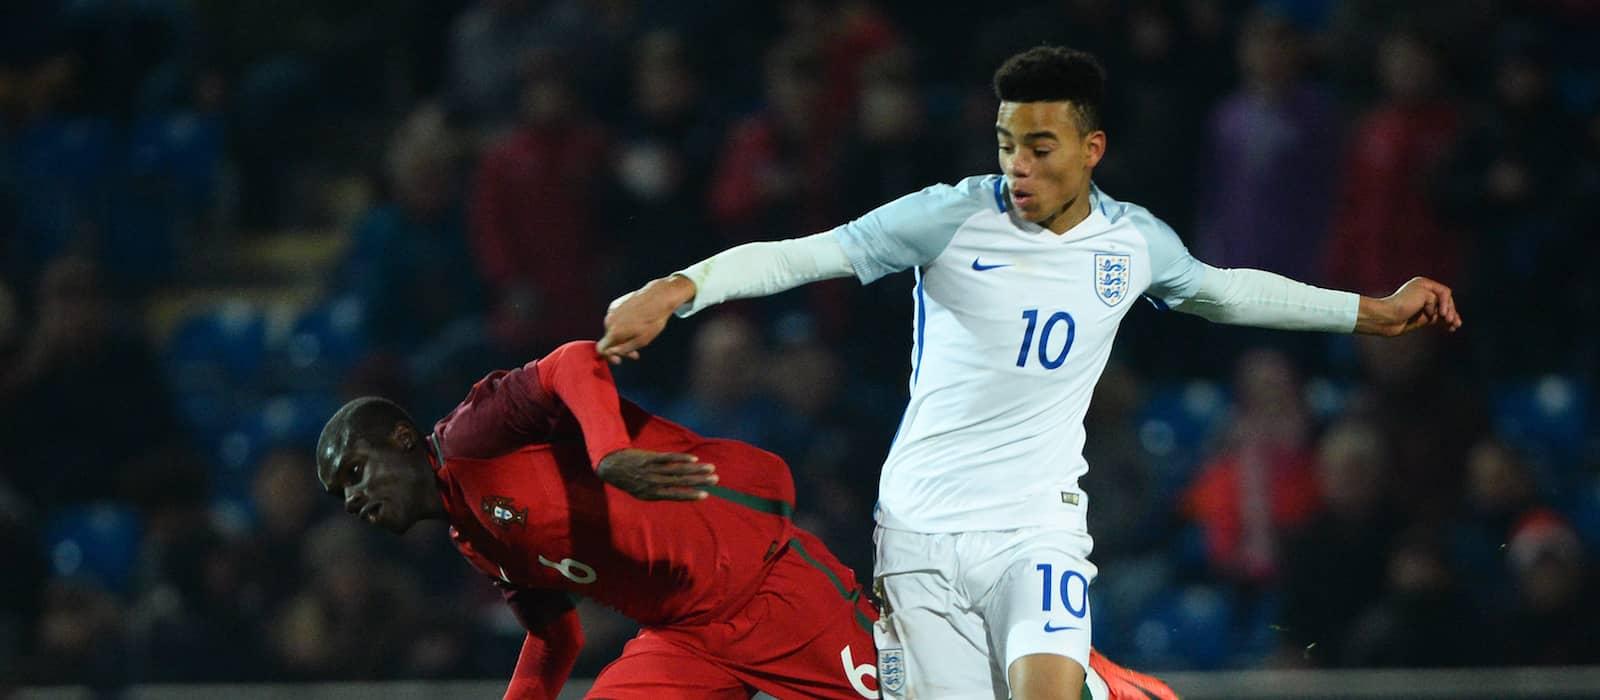 Clayton Blackmore talks up Manchester United academy scholar Mason Greenwood